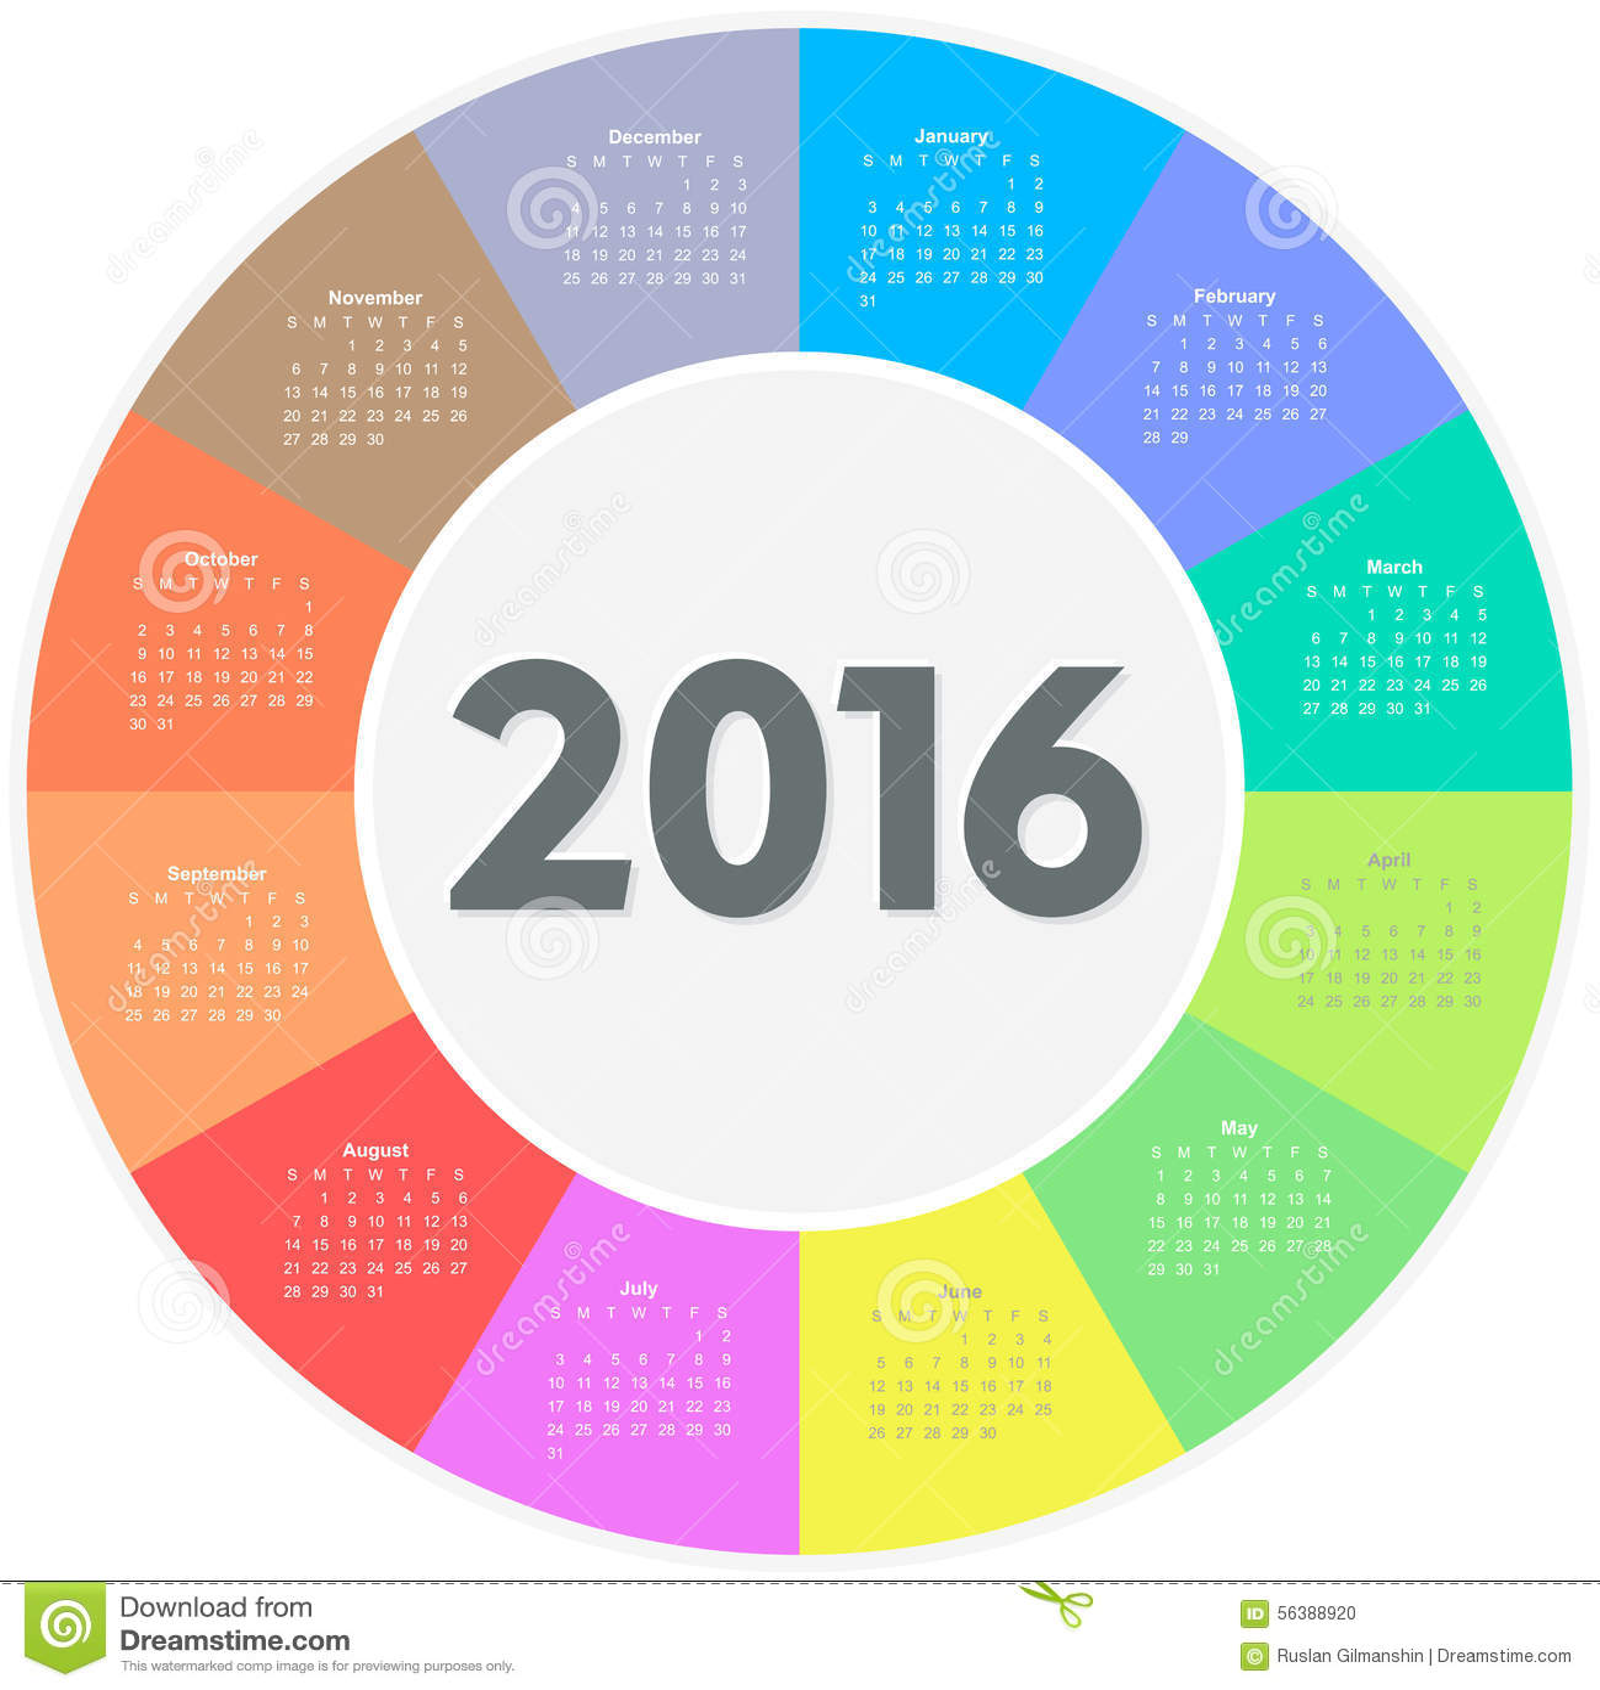 Circle Calendar For 2016 Year Stock Vector - Image: 56388920